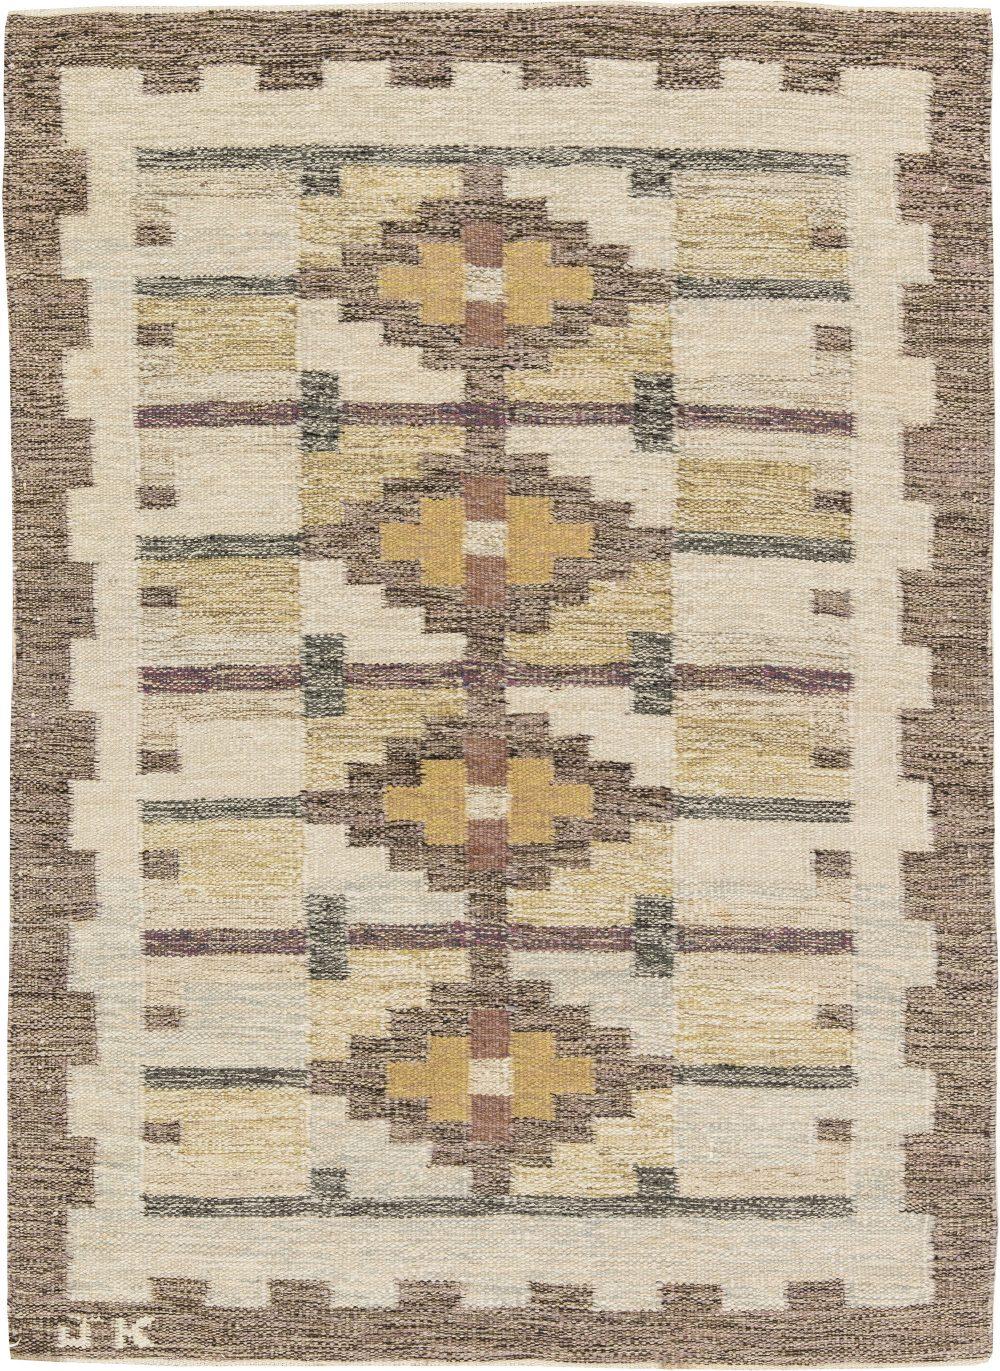 Vintage Swedish Flat Weave Rug BB6286